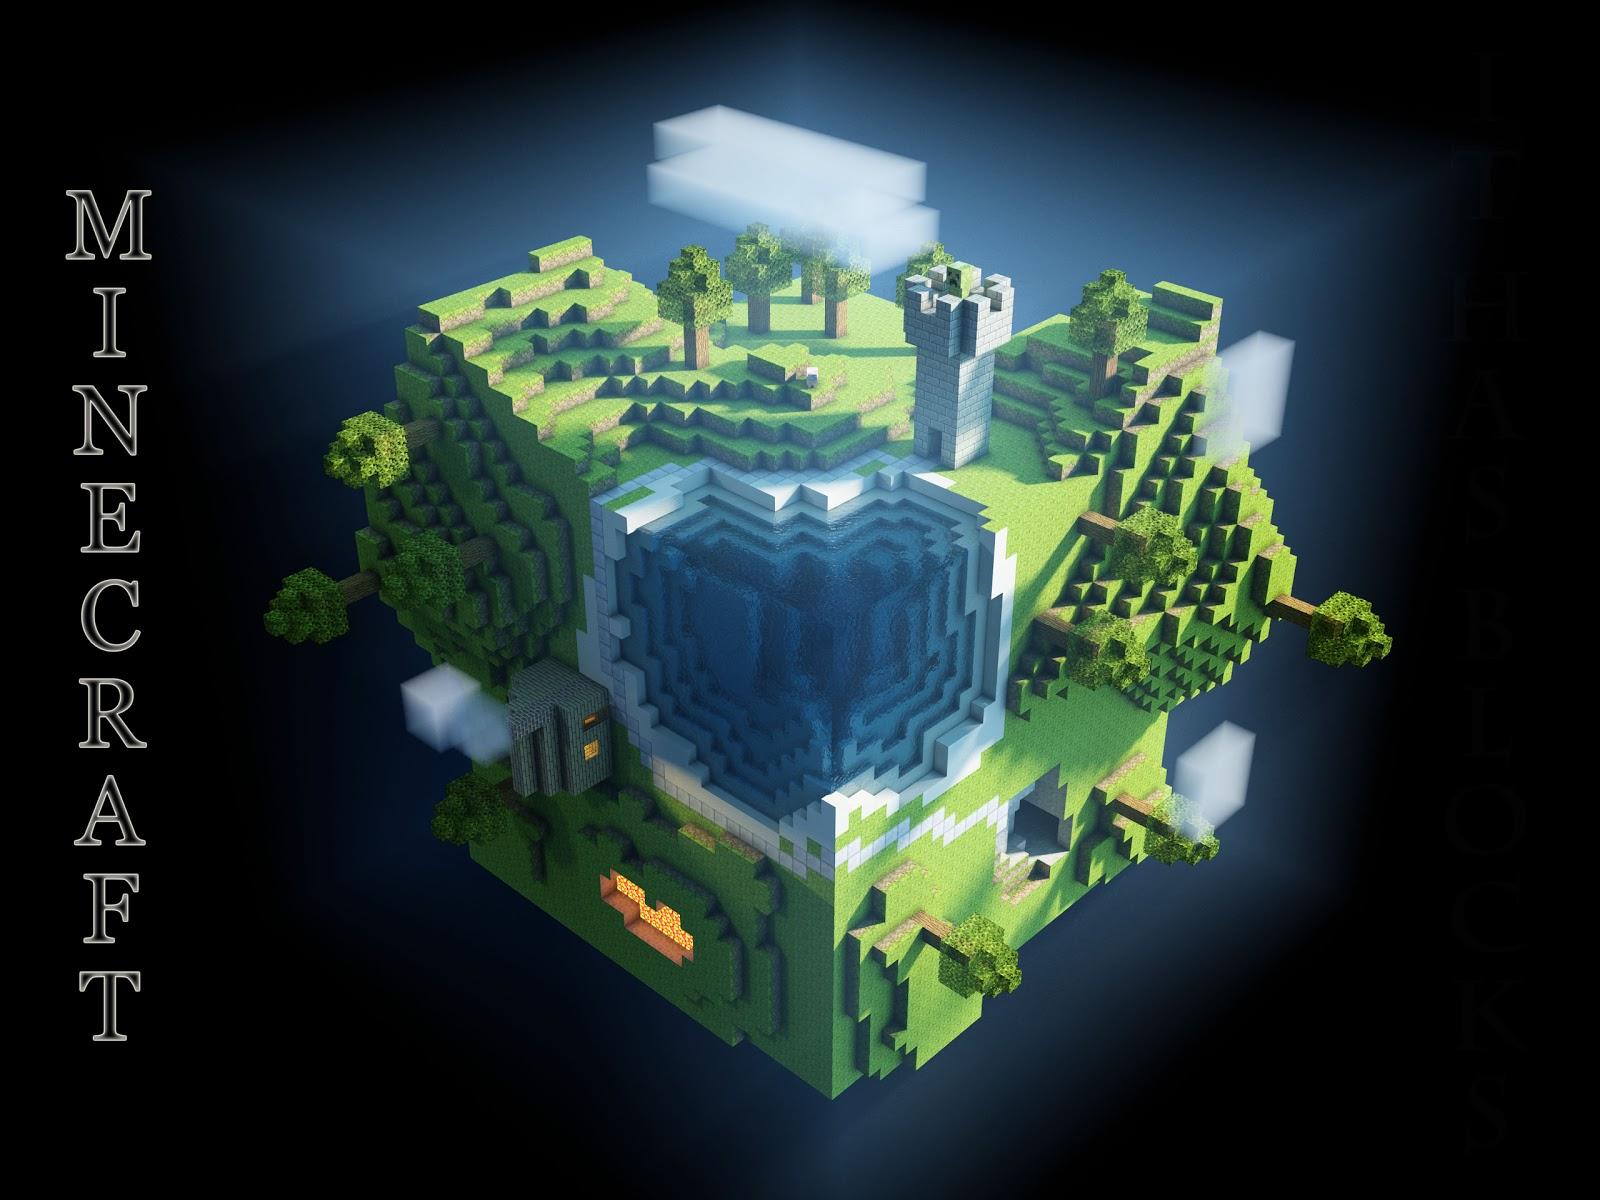 http://1.bp.blogspot.com/-Z4hphThZaa0/TqsI4SWaGdI/AAAAAAAAAgA/0BJD3HbSNak/s1600/Minecraft+Wallpaper+HD+4096x3072.jpg